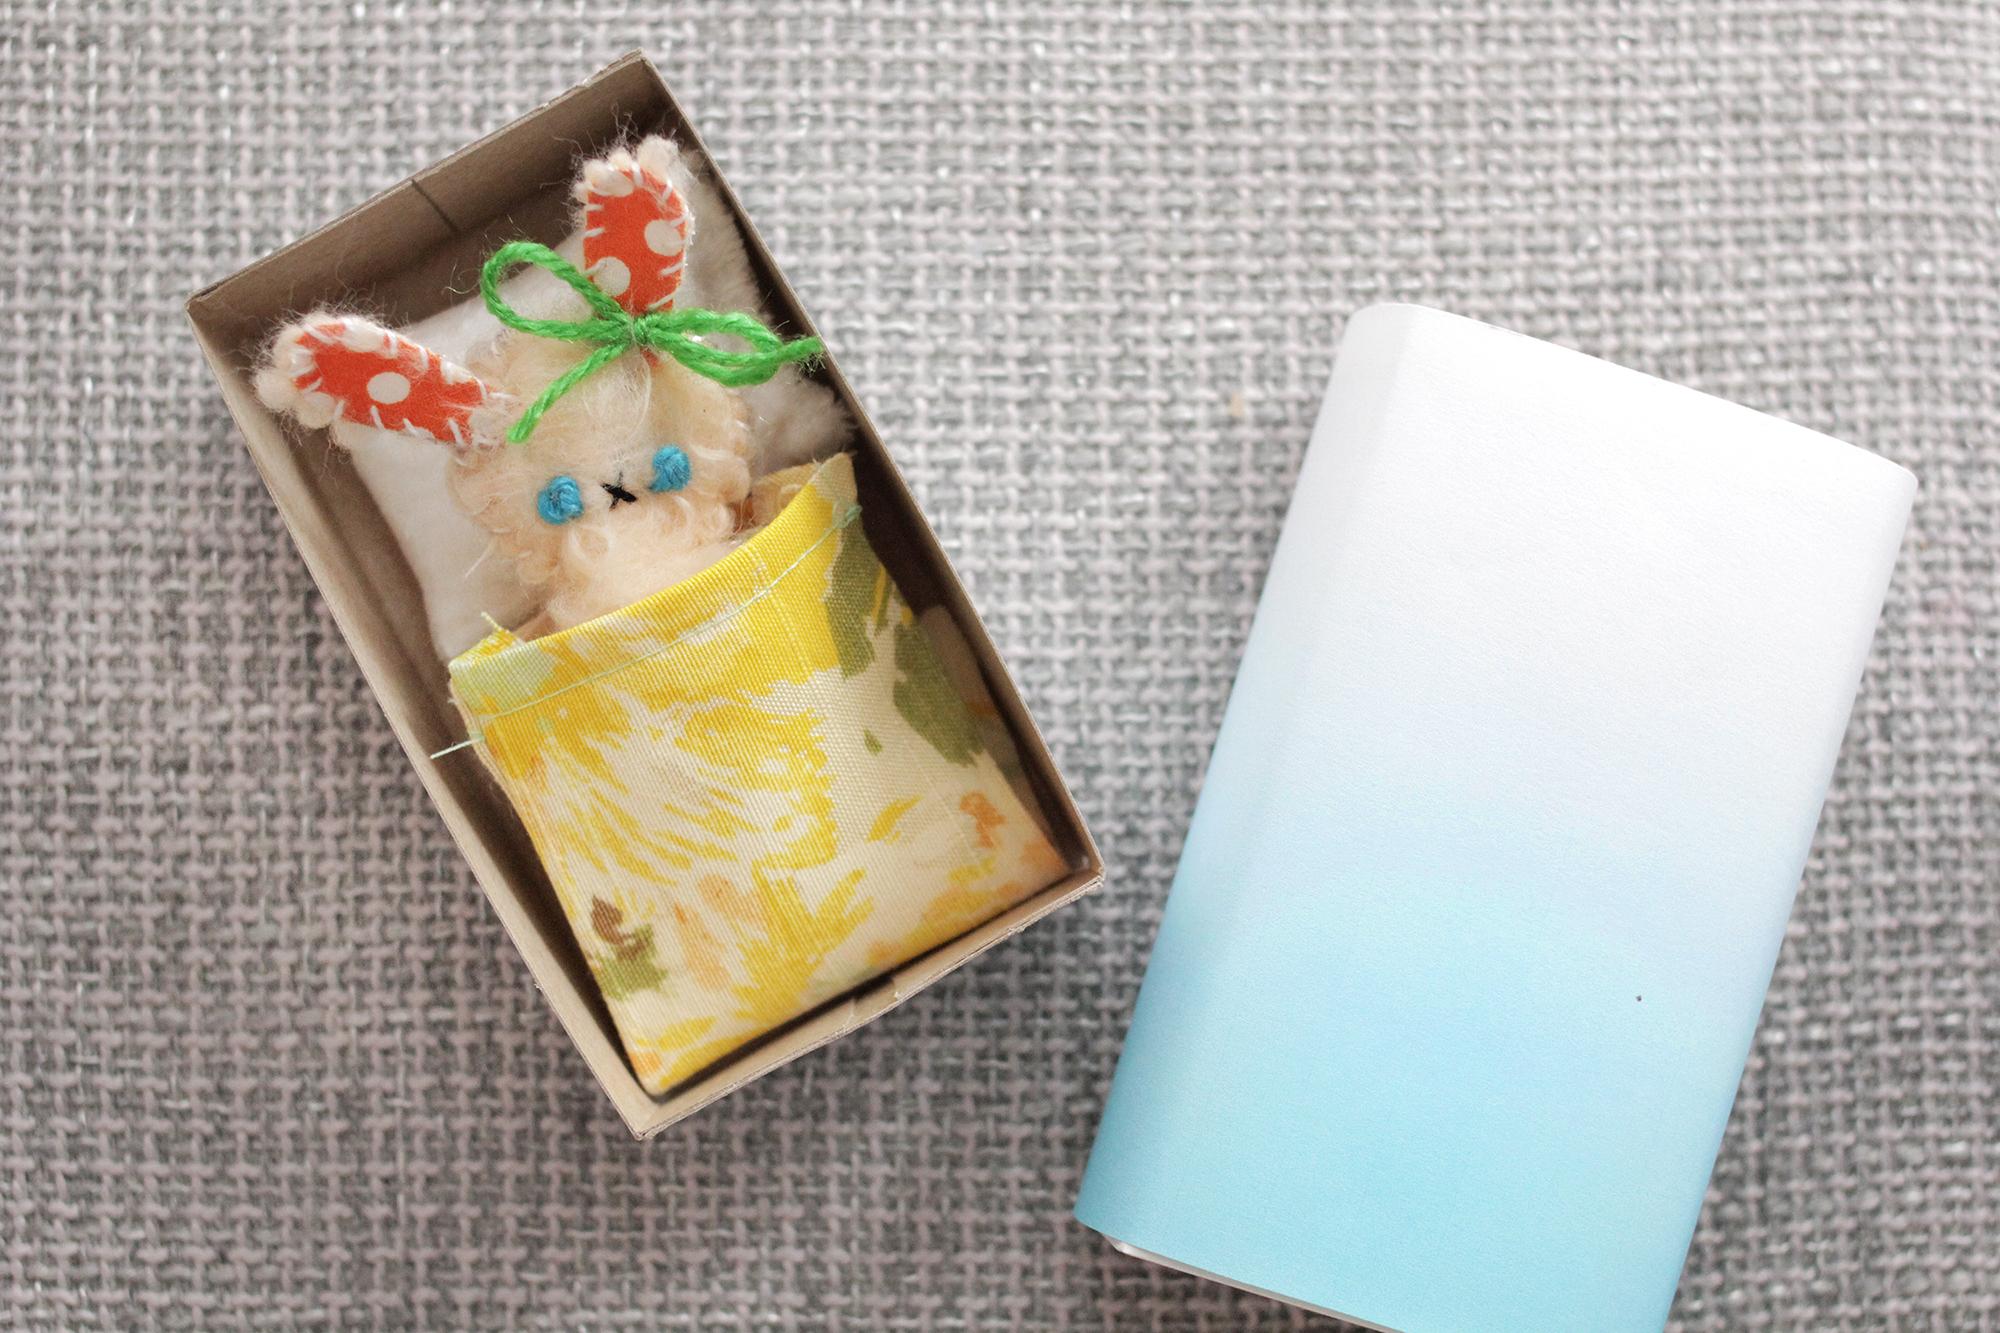 Matchbox dolls are such a fun handmade gift (click through for tutorial)